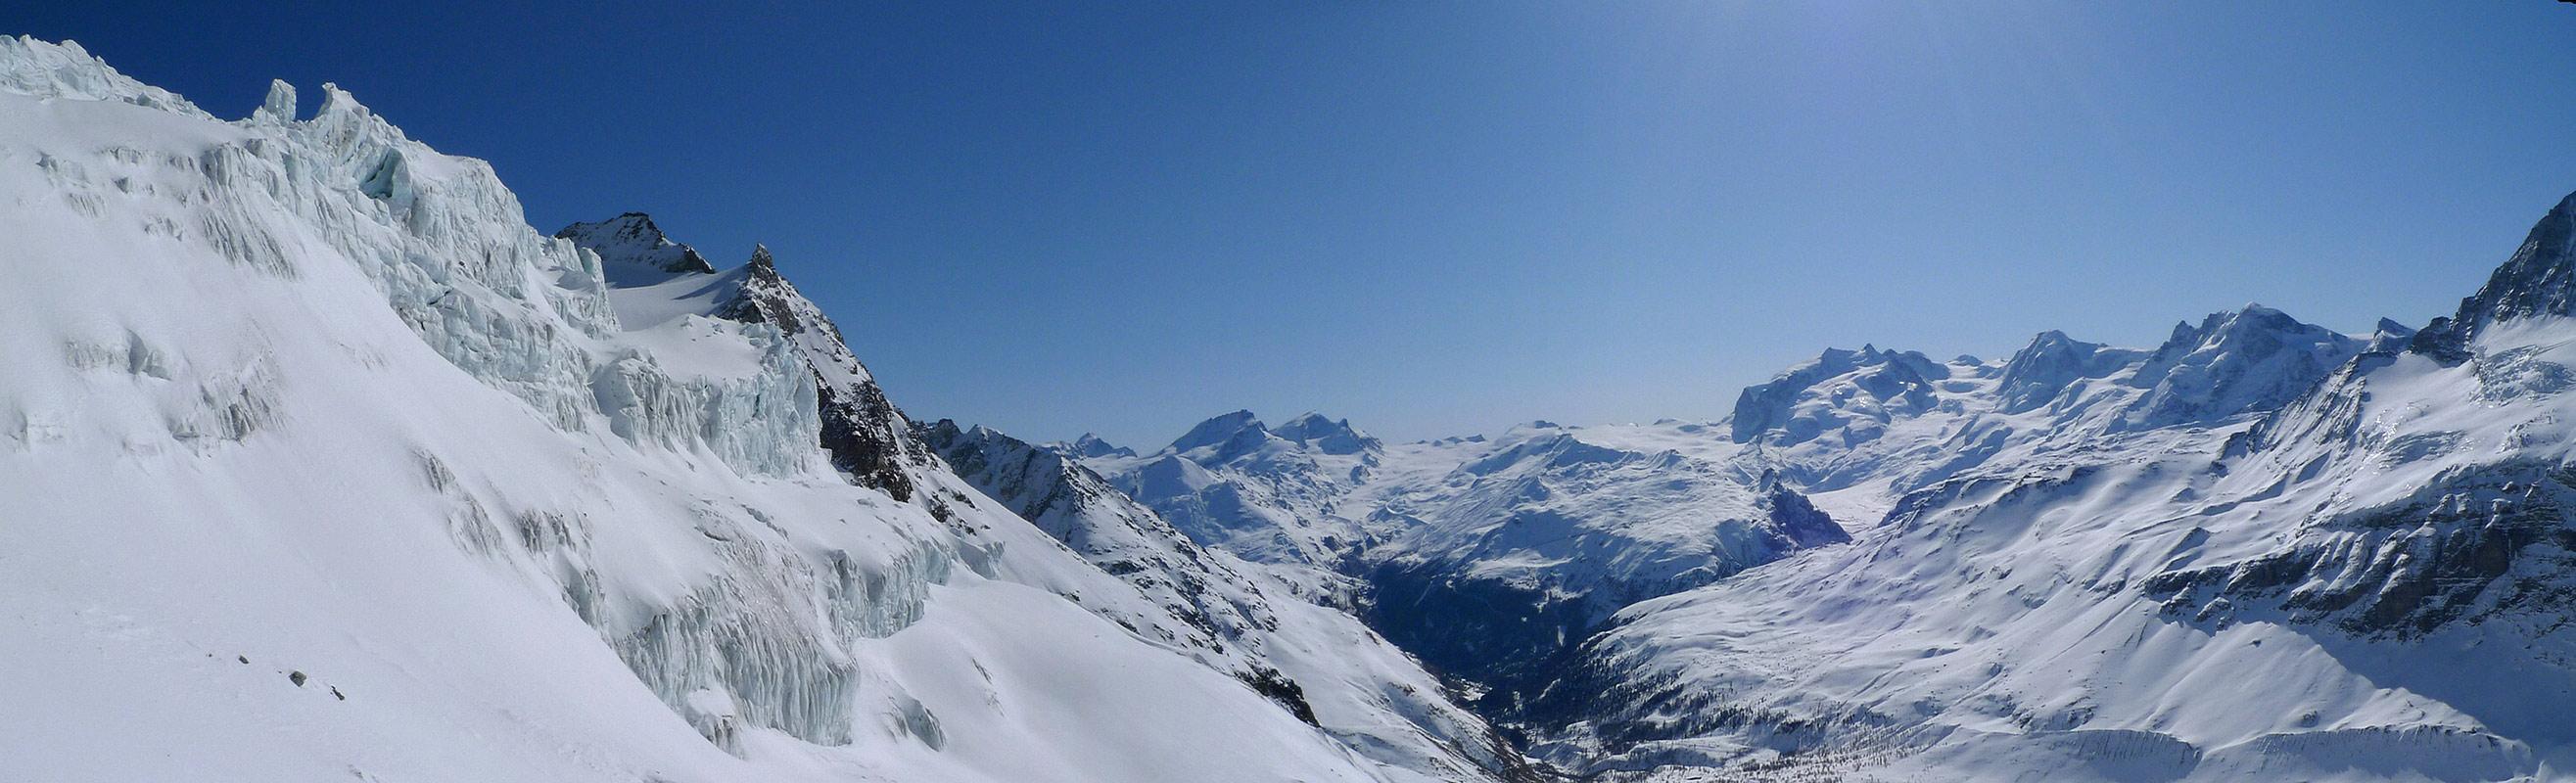 Mont Durand / Arbenhorn Walliser Alpen / Alpes valaisannes Switzerland panorama 33